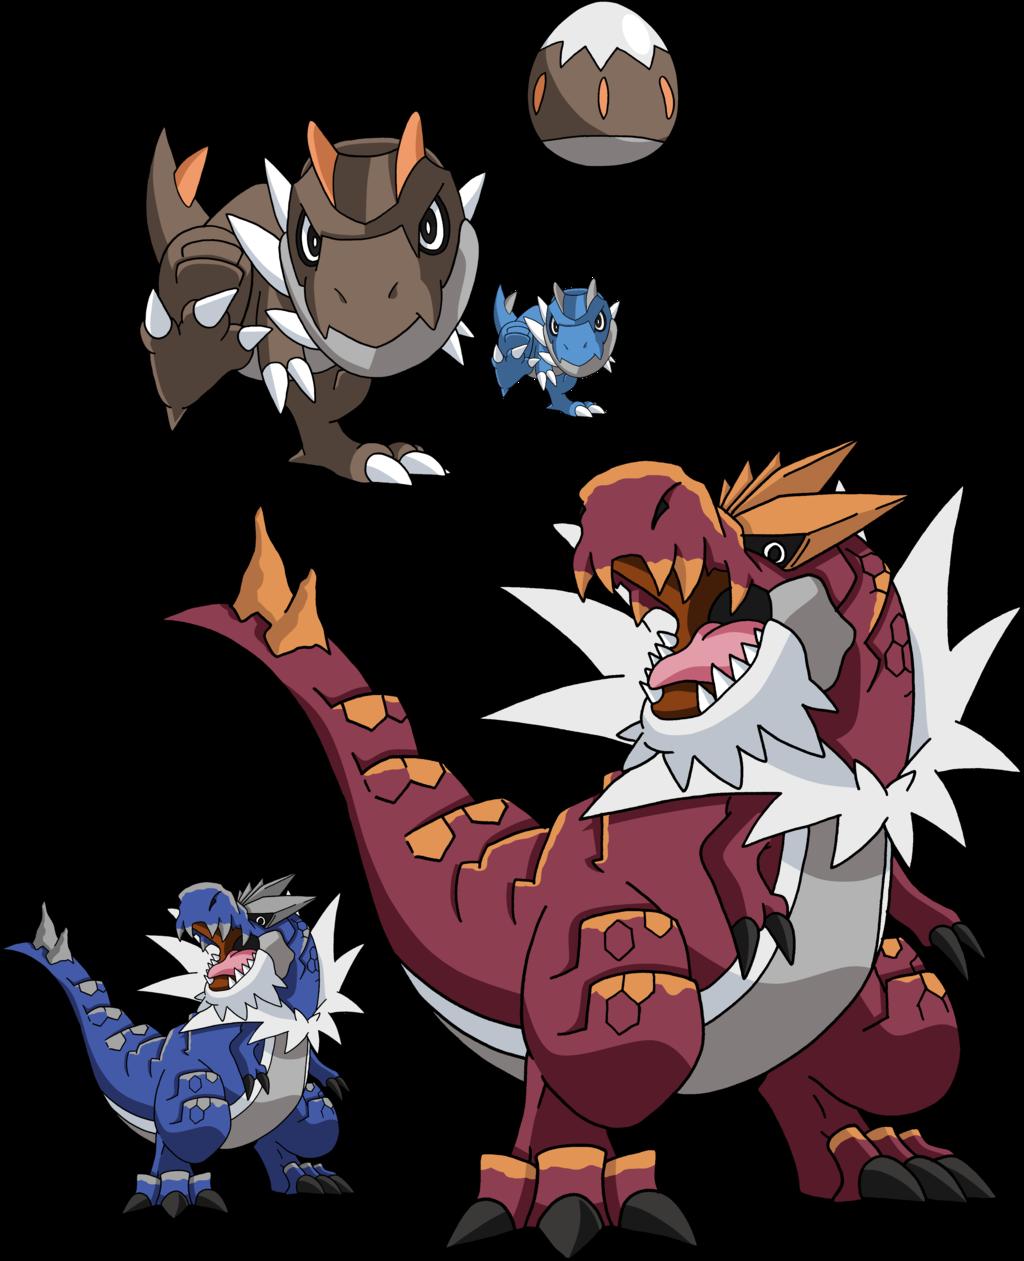 696 and 697 - Tyrunt Evolutionary Family by Tails19950 on deviantART |  Dragon type pokemon, Pokemon tyrantrum, Pokemon fusion art